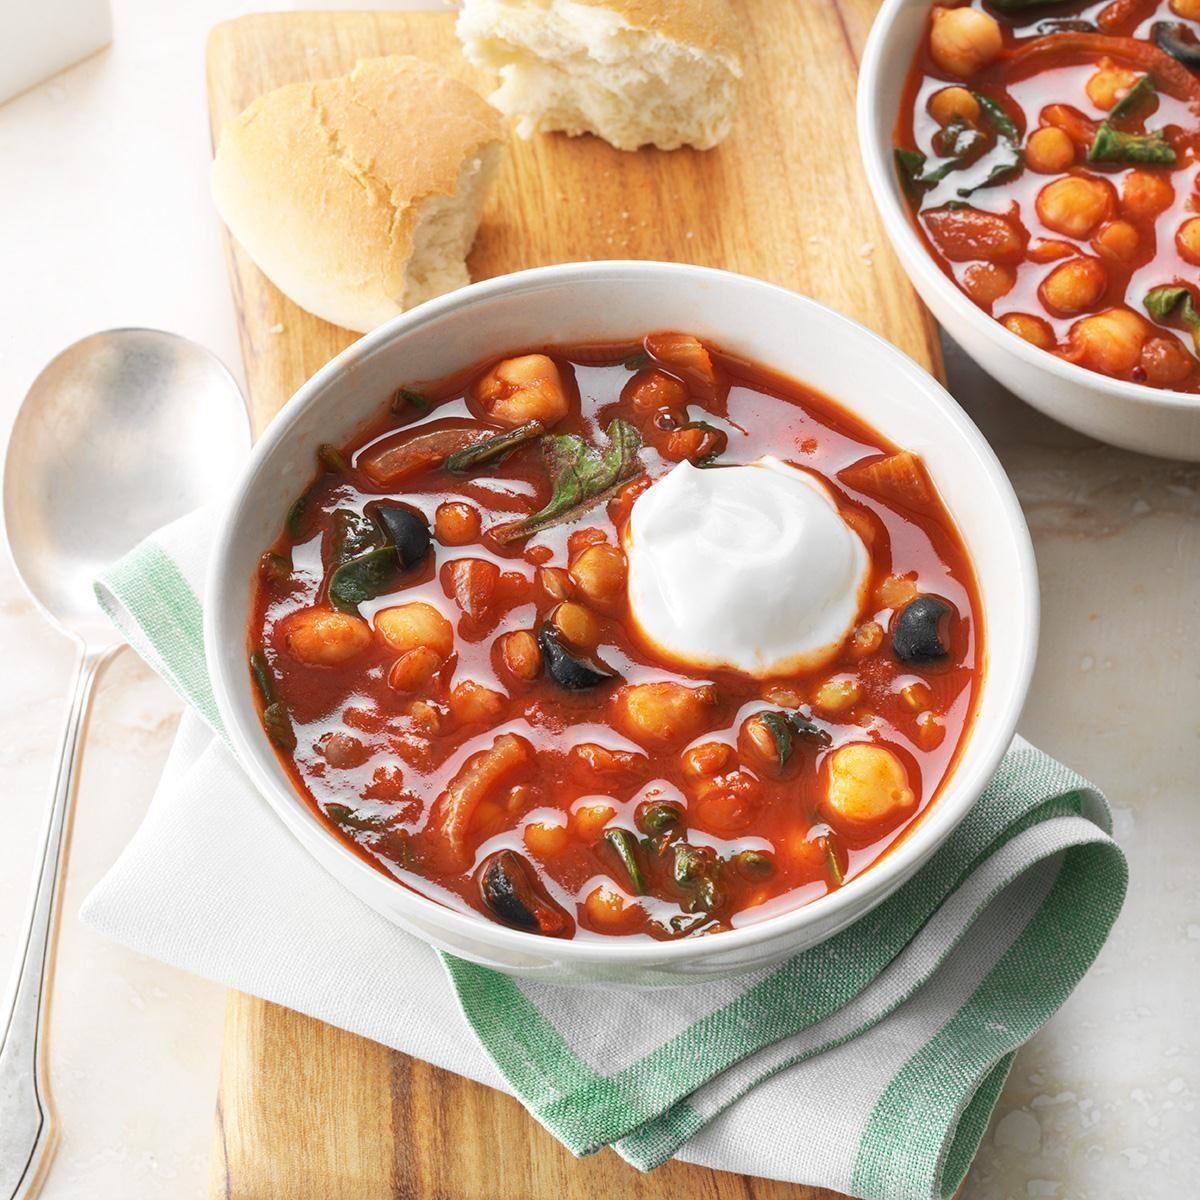 Spicy Lentil Amp Chickpea Stew Recipe Taste Of Home